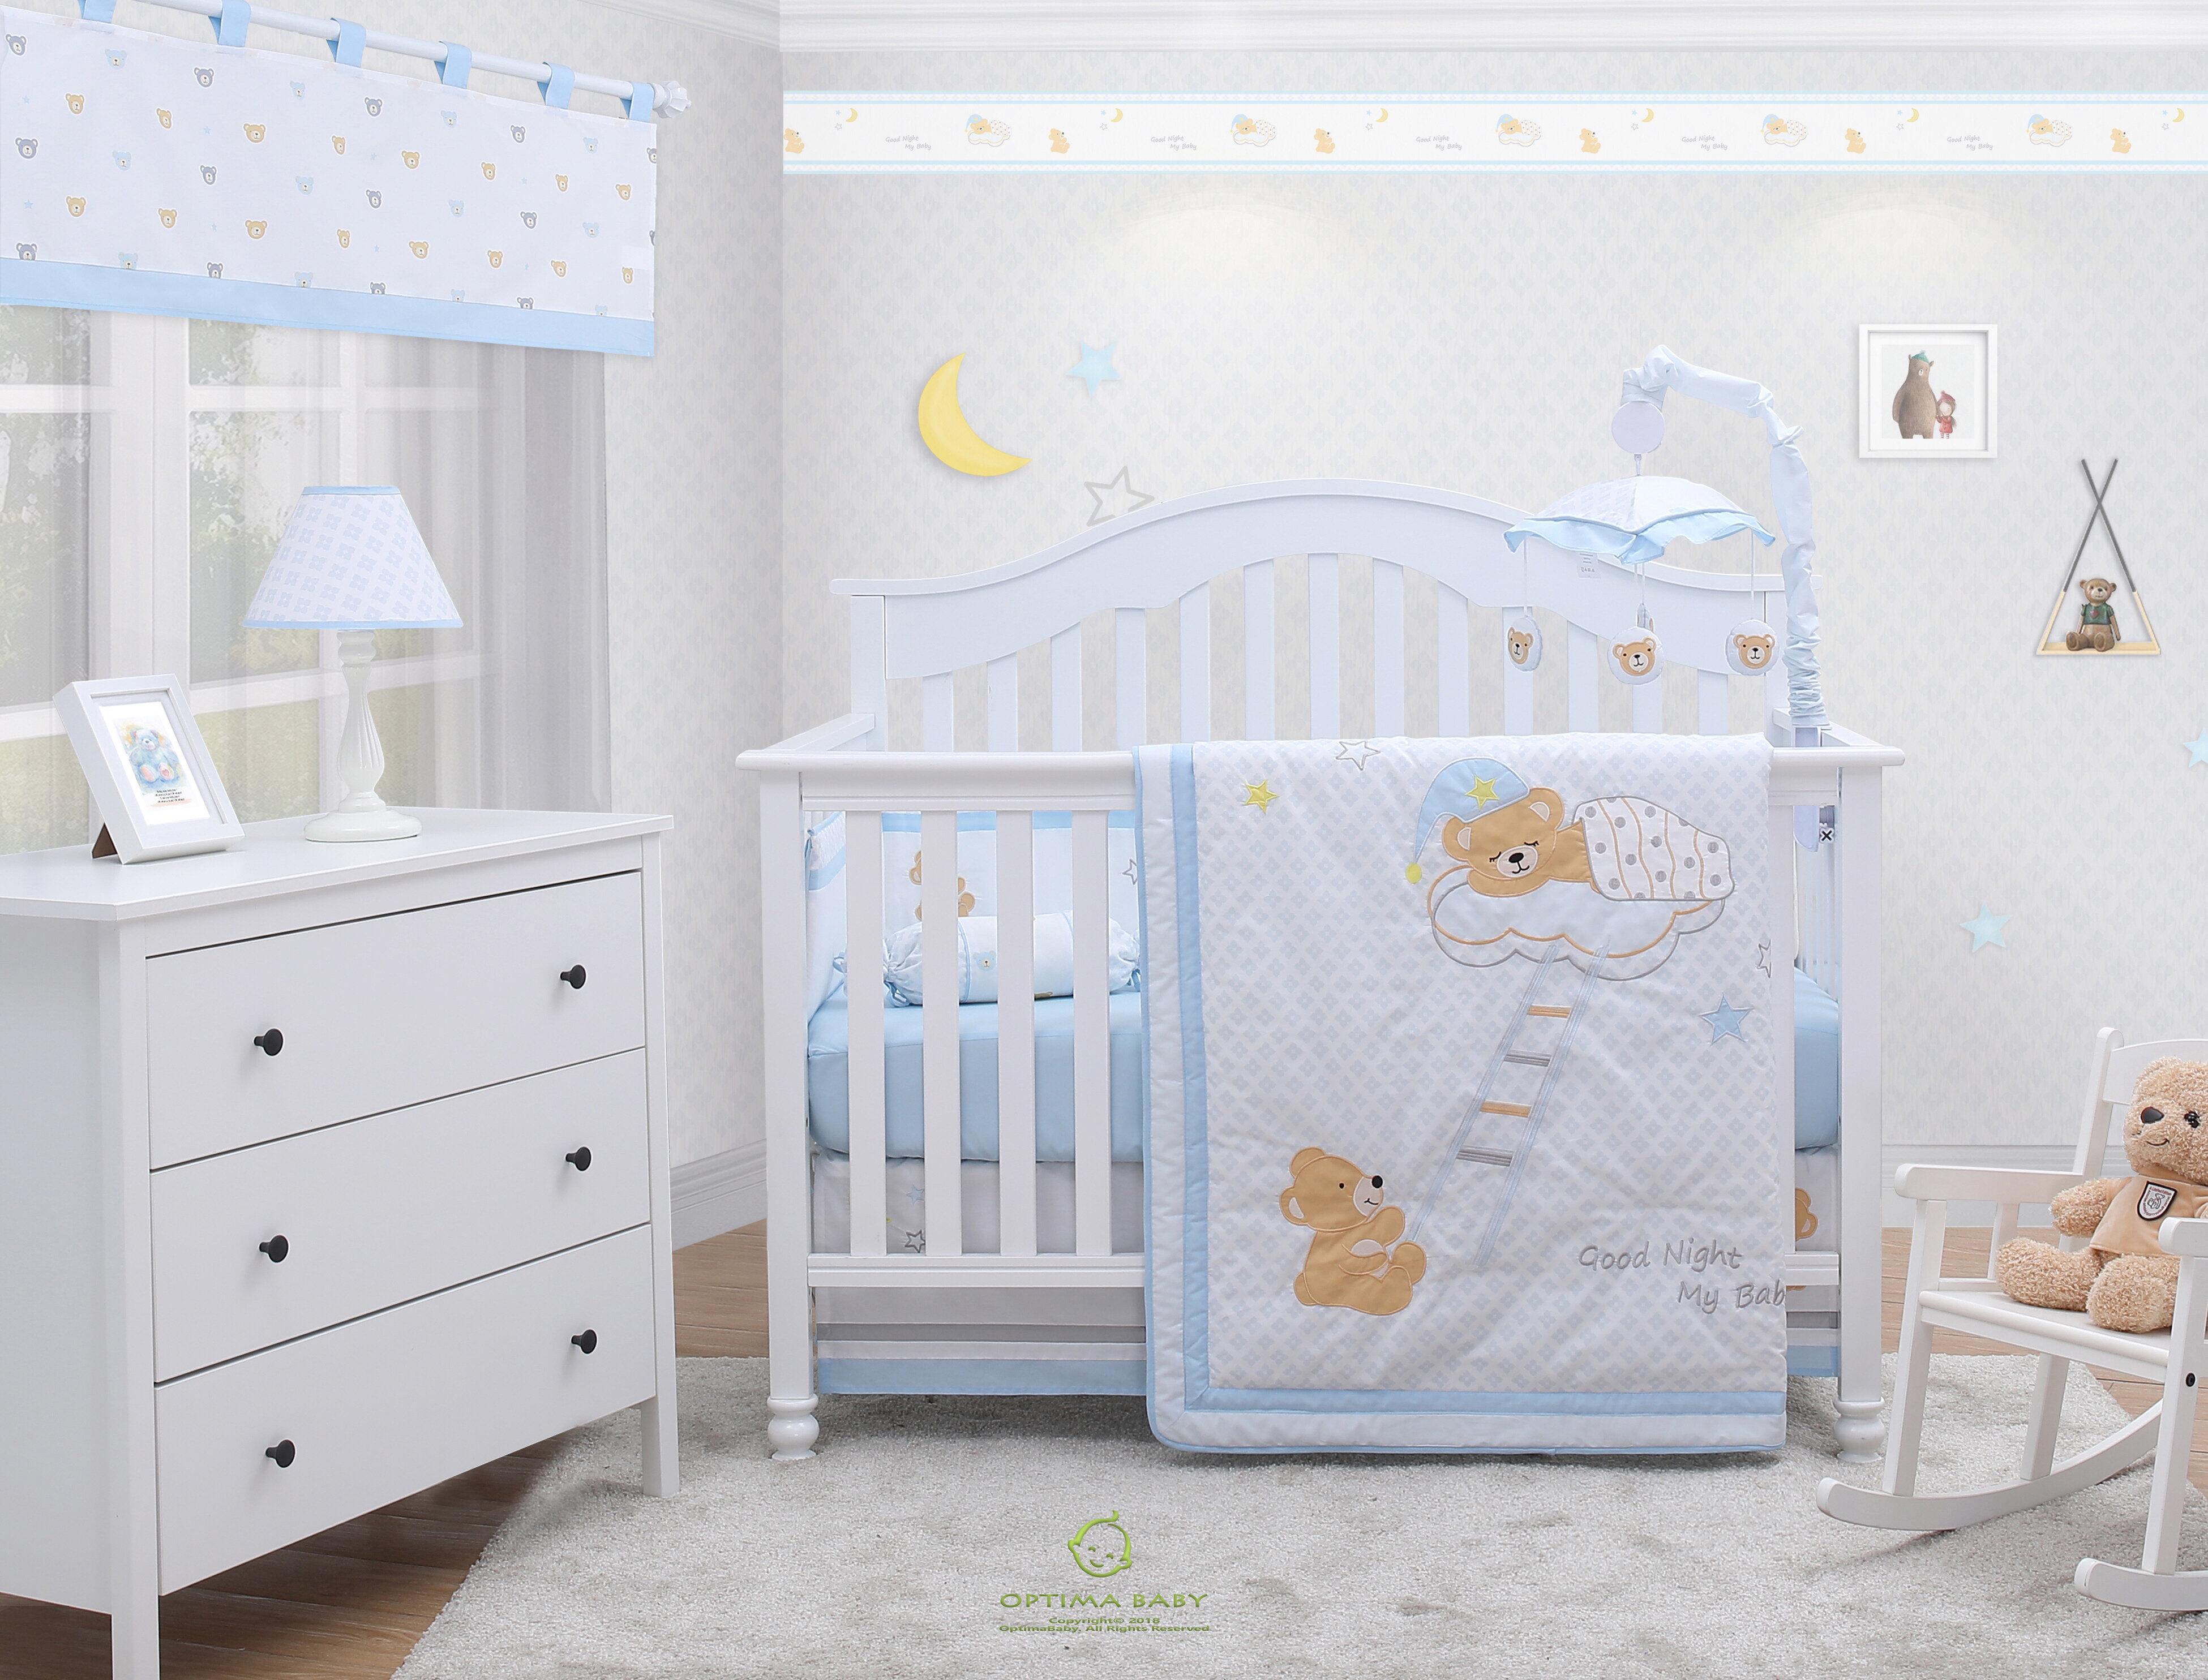 Zoomie Kids Rasmussen Moon and Star Teddy Bear Baby Nursery 5